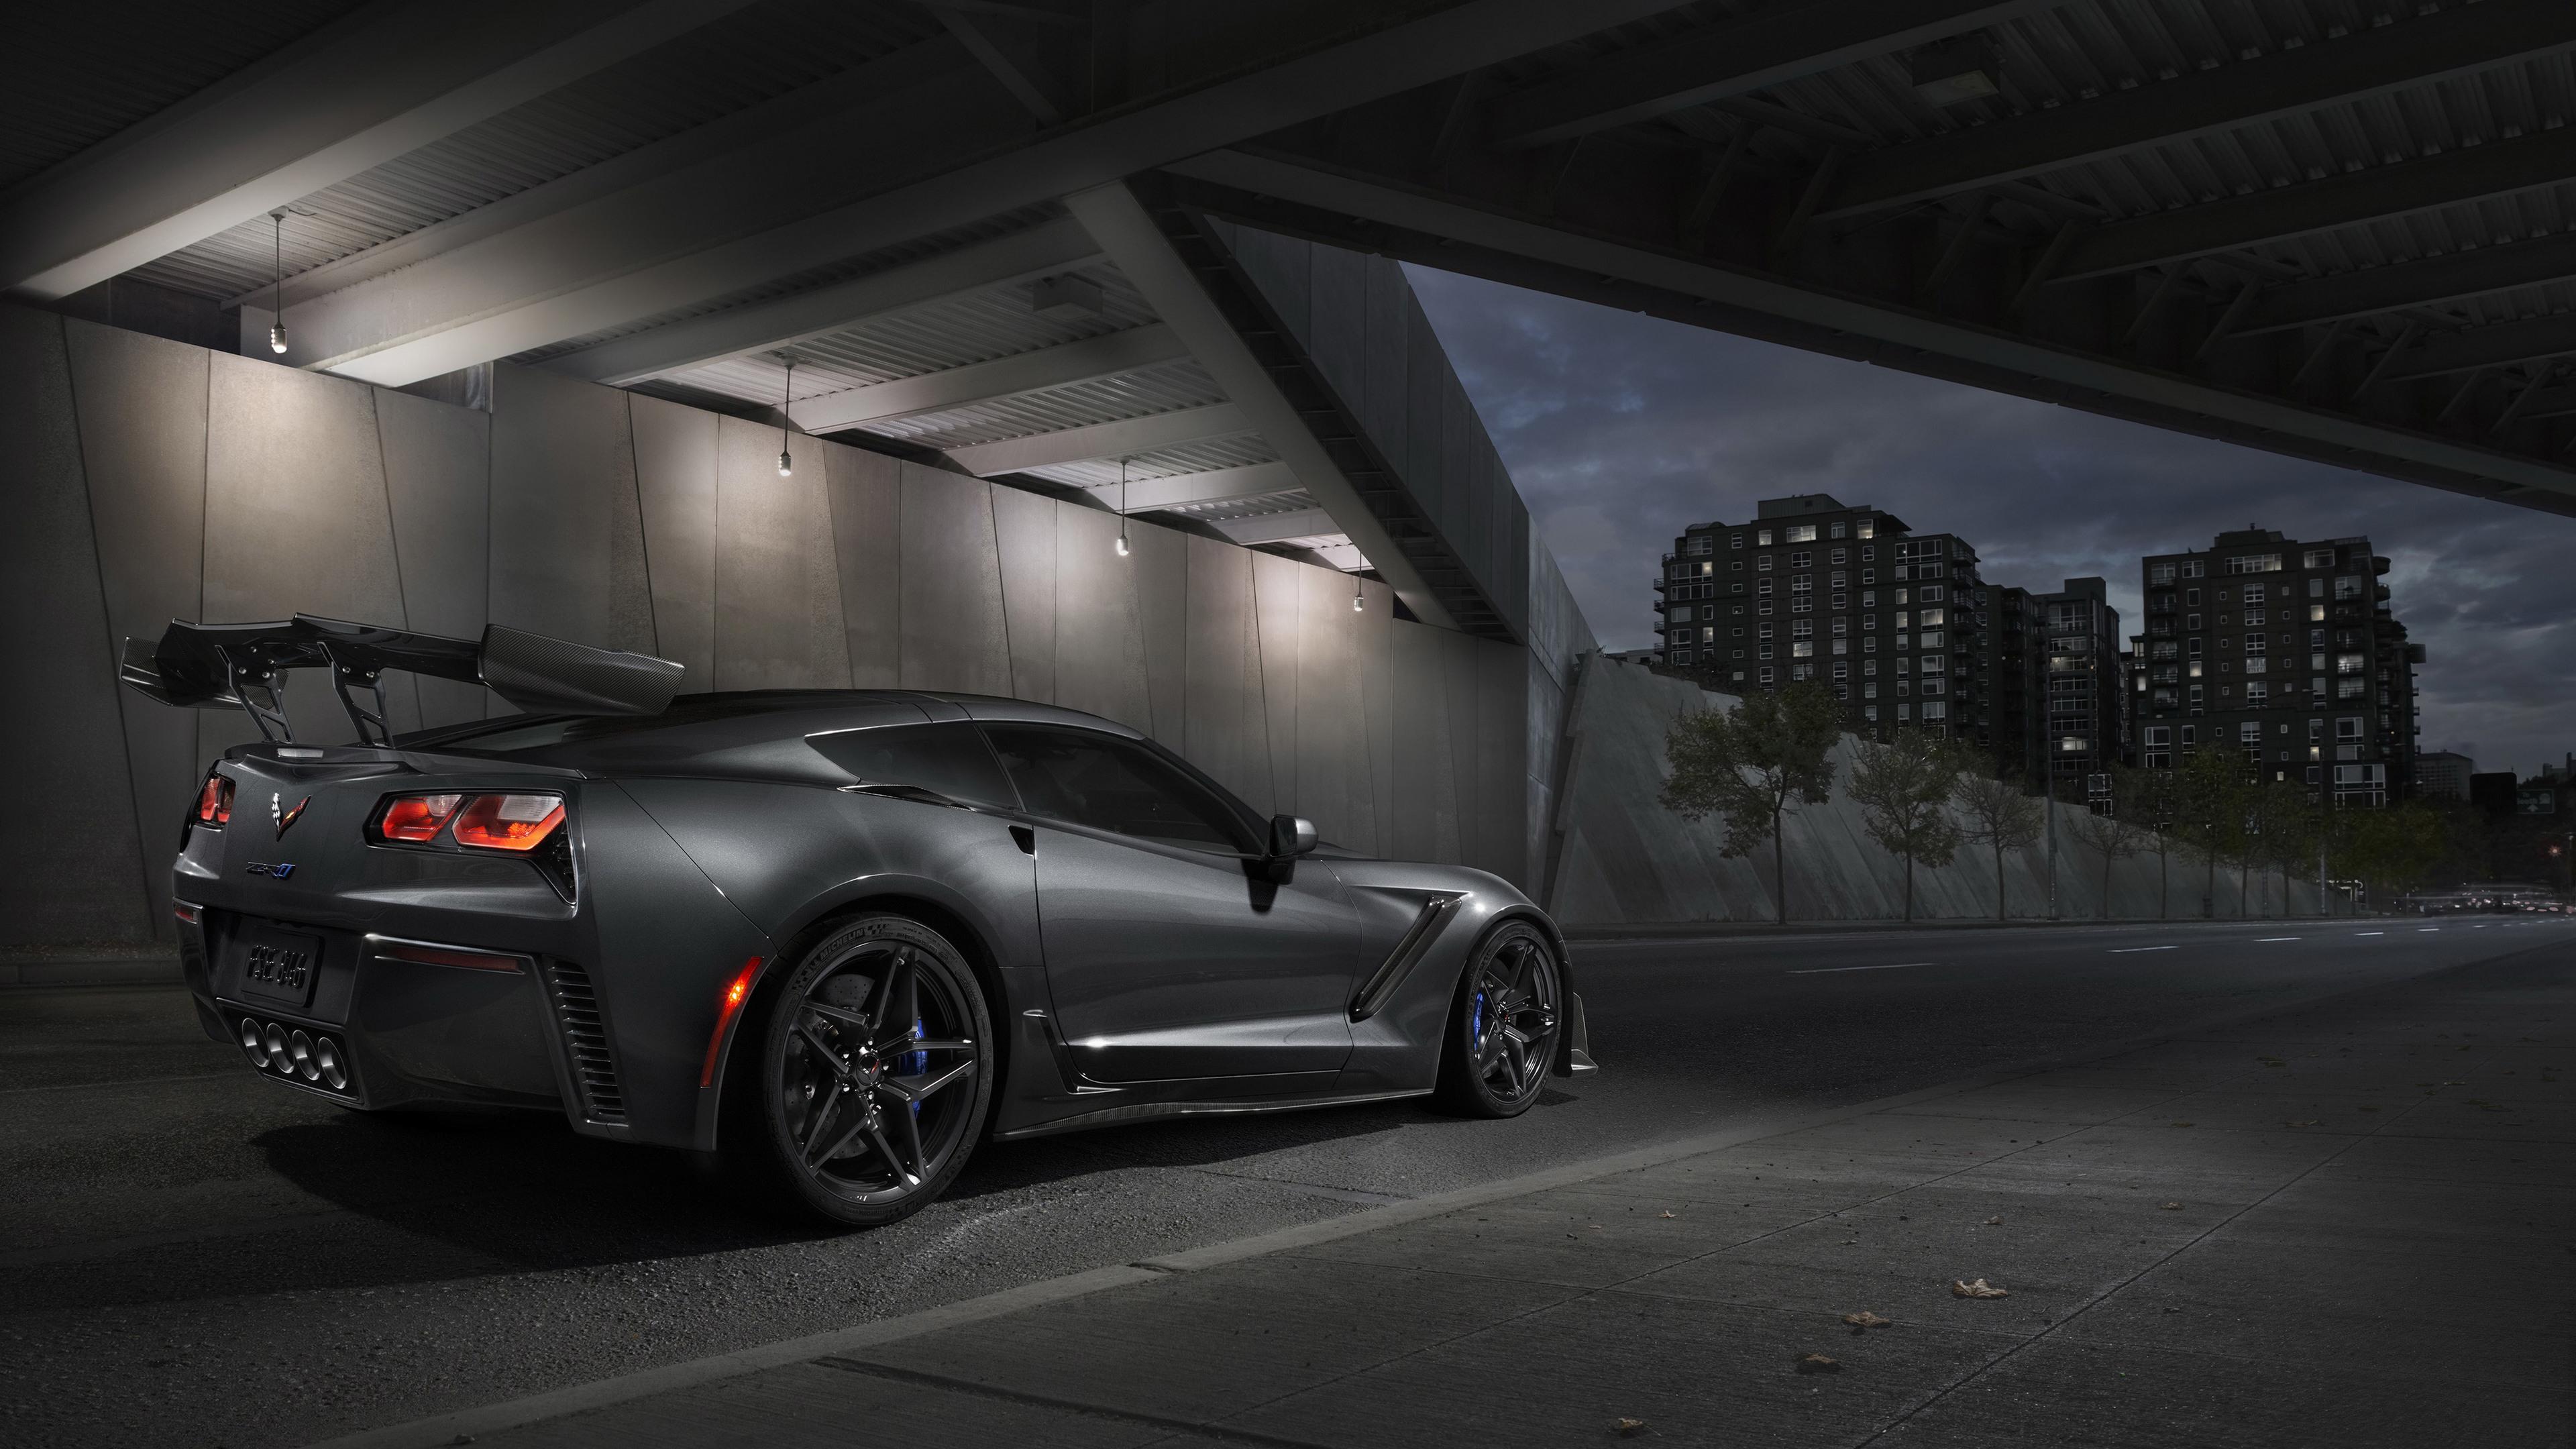 chevrolet corvette zr1 2019 1539107978 - Chevrolet Corvette ZR1 2019 - hd-wallpapers, corvette wallpapers, chevrolet wallpapers, chevrolet corvette zr1 wallpapers, cars wallpapers, 4k-wallpapers, 2019 cars wallpapers